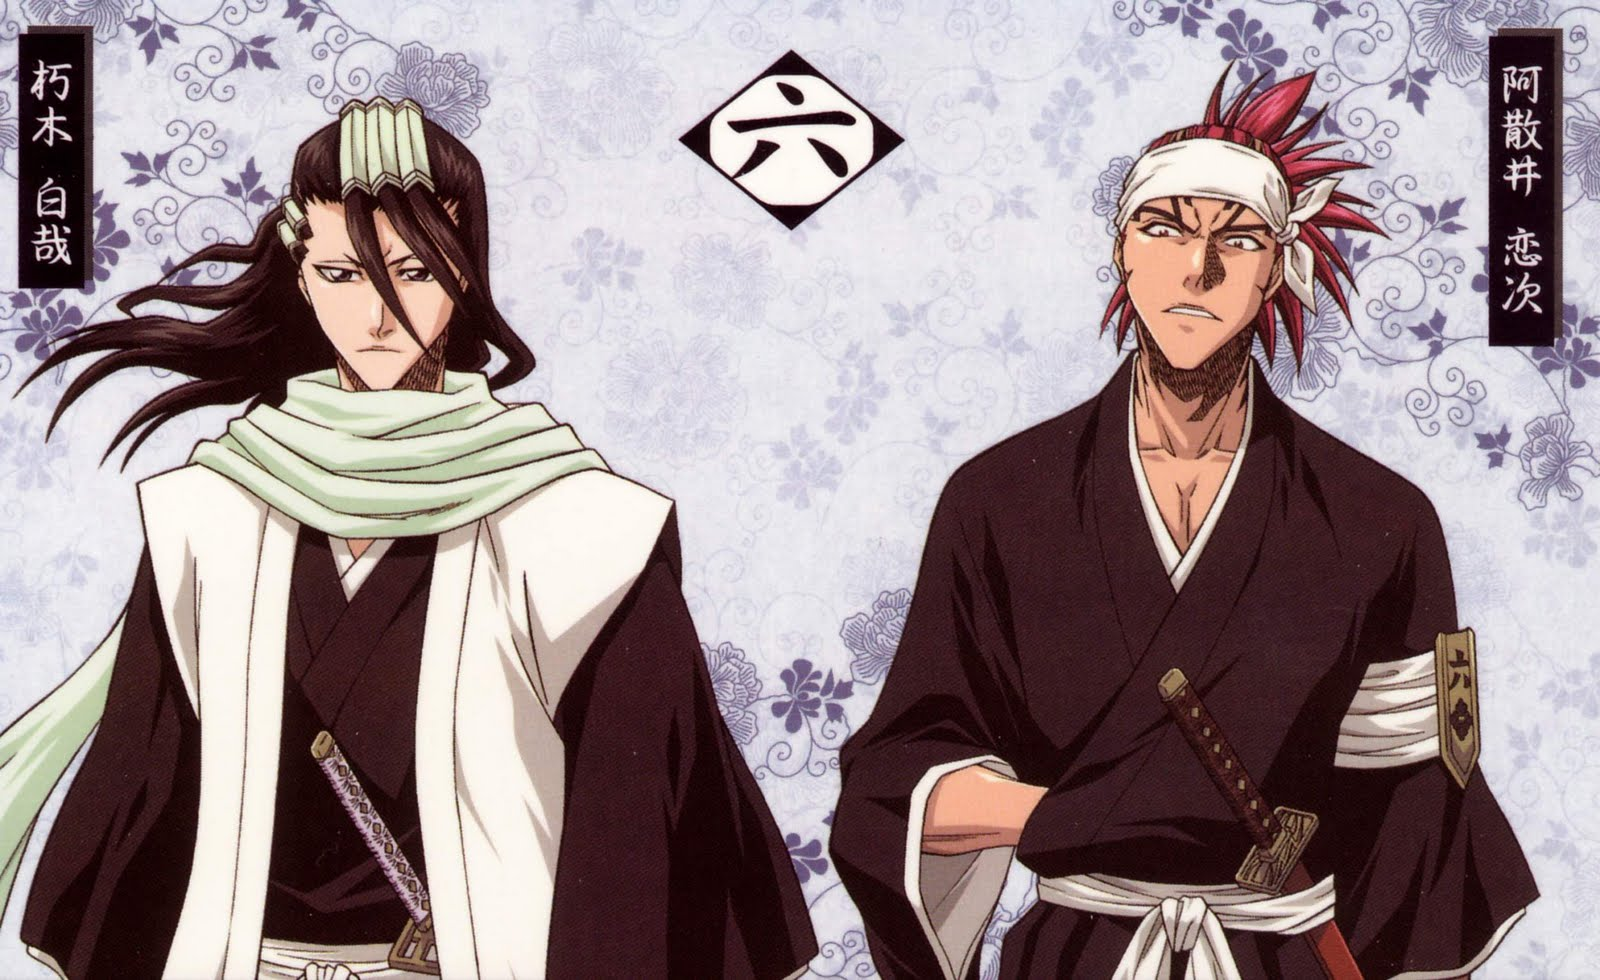 http://3.bp.blogspot.com/-eqD926benT0/TlODRlBTu9I/AAAAAAAAA9E/fJeb3BfPoek/s1600/Bleach_wallpaper_Byakuya-Kuchiki-and-Renji-Abarai.jpg